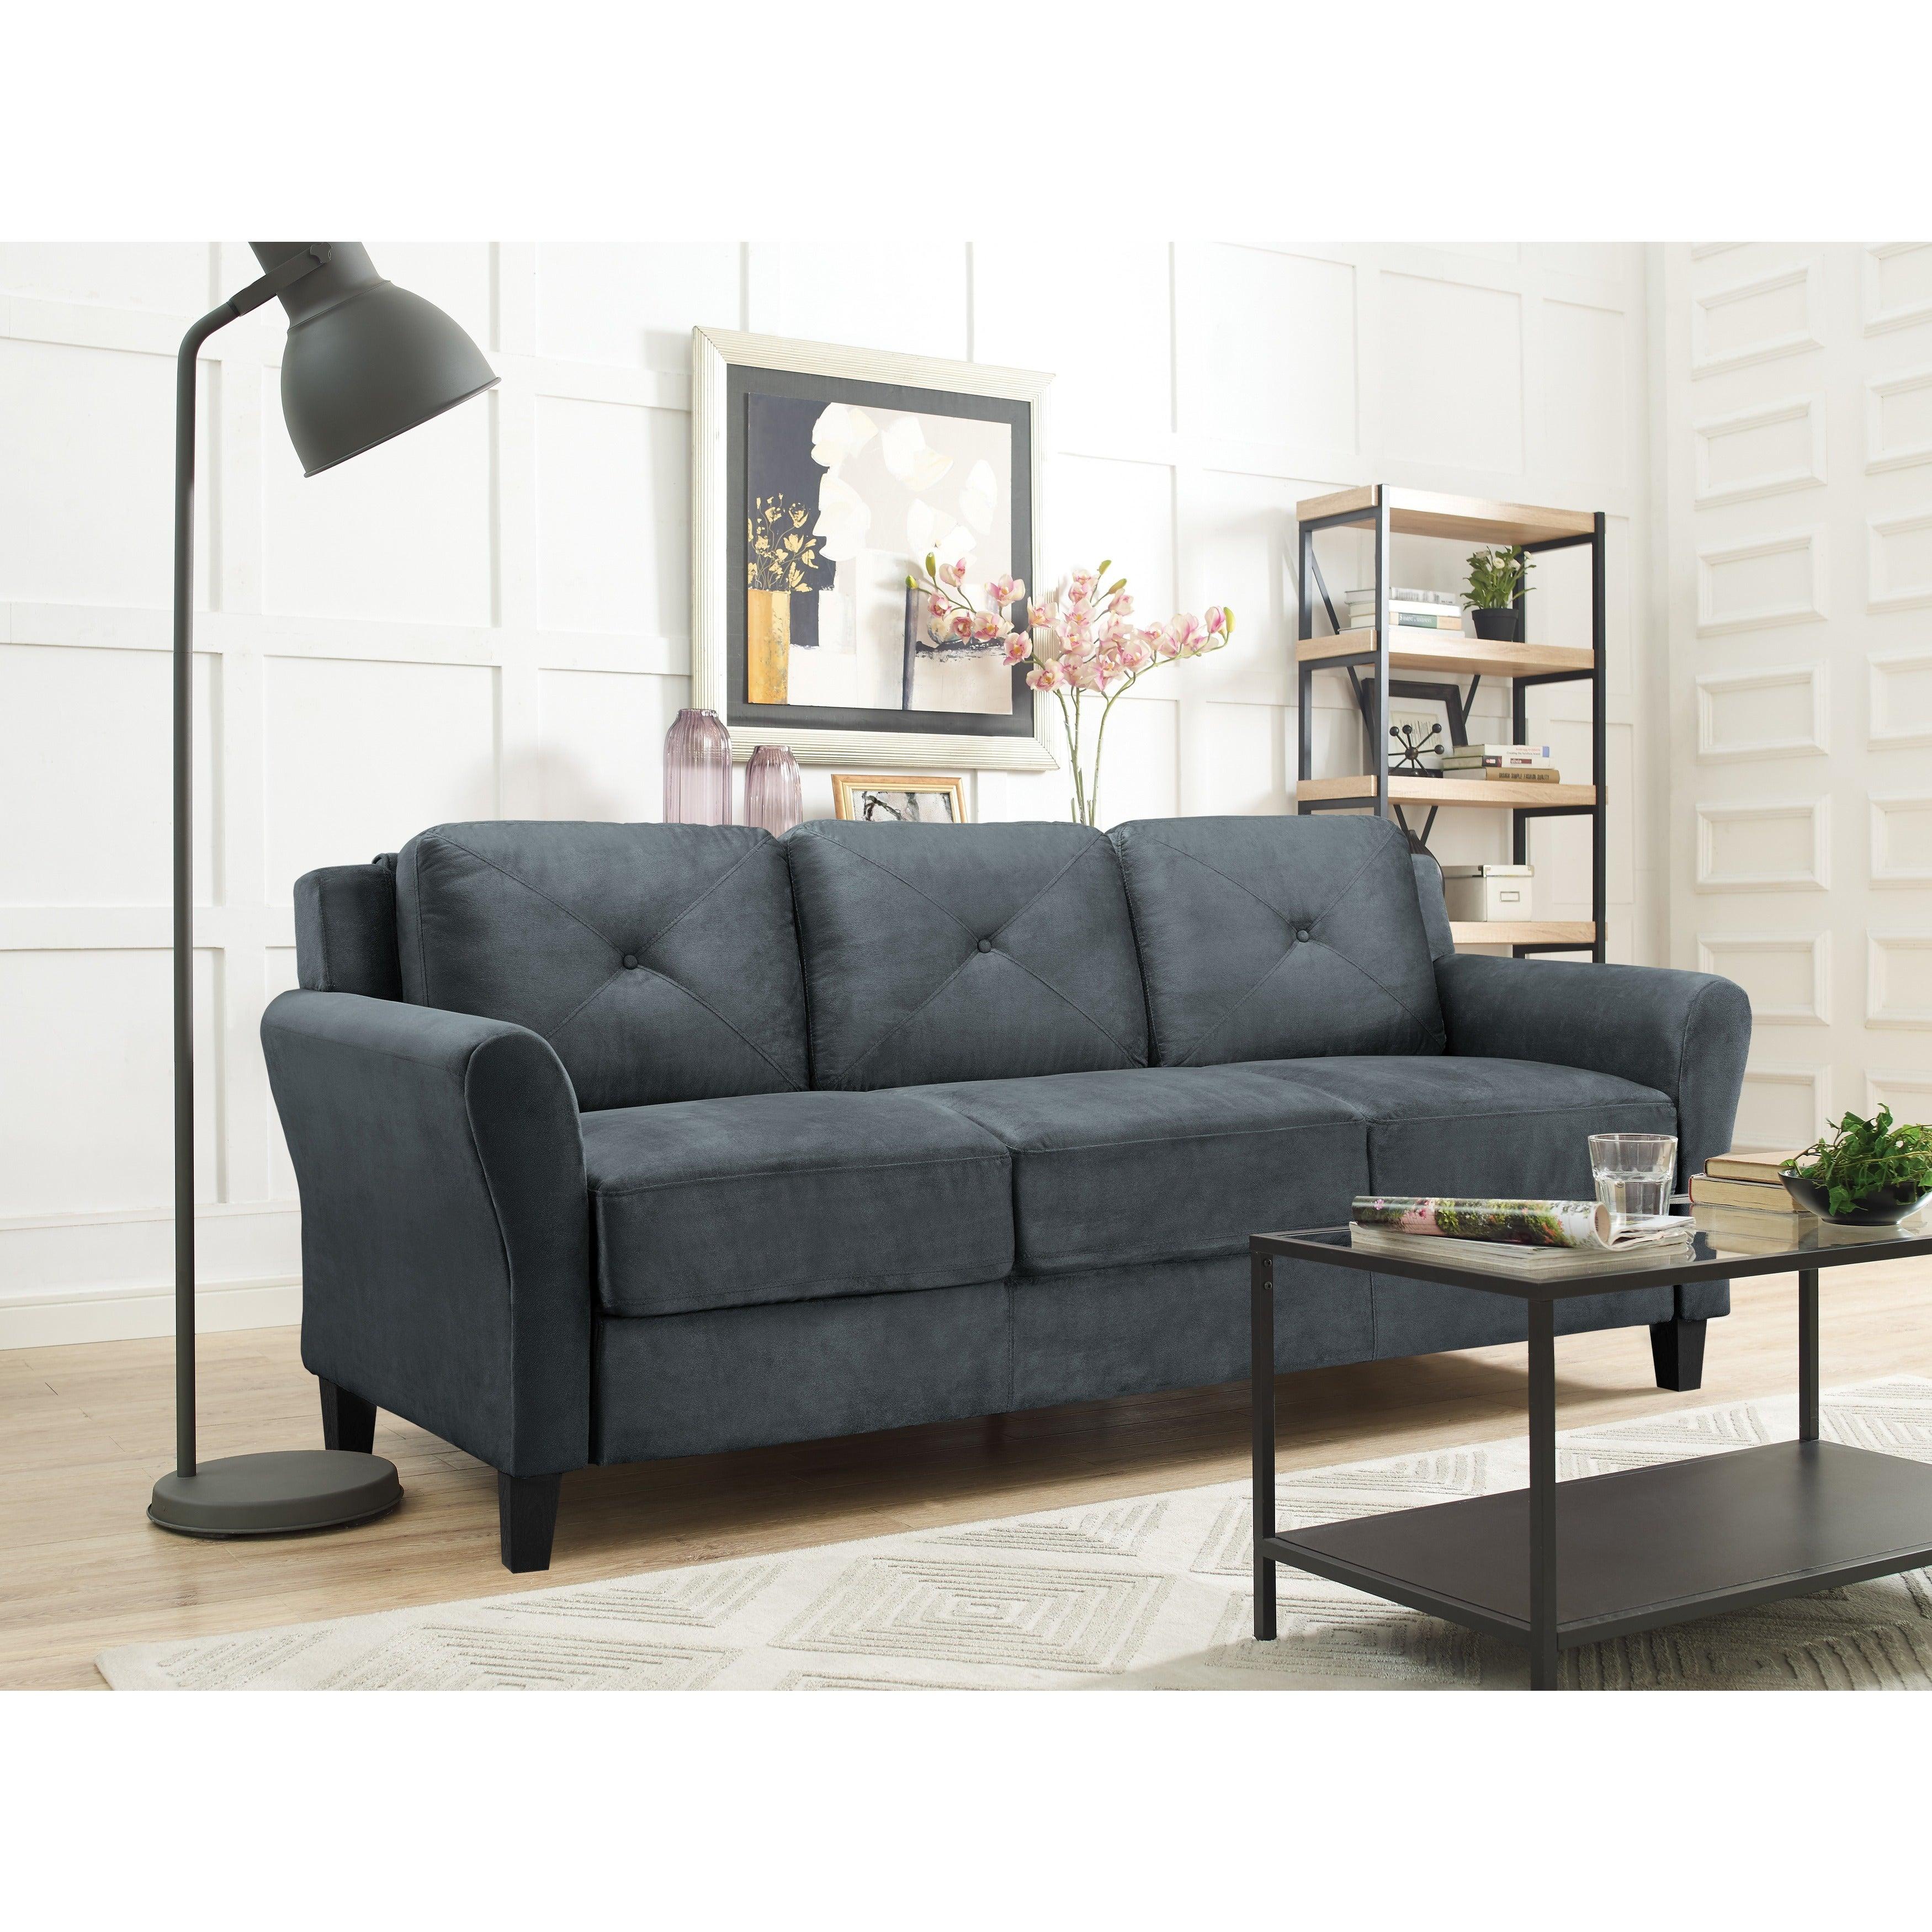 of amazing com bed sofa microfiber also aifaresidency